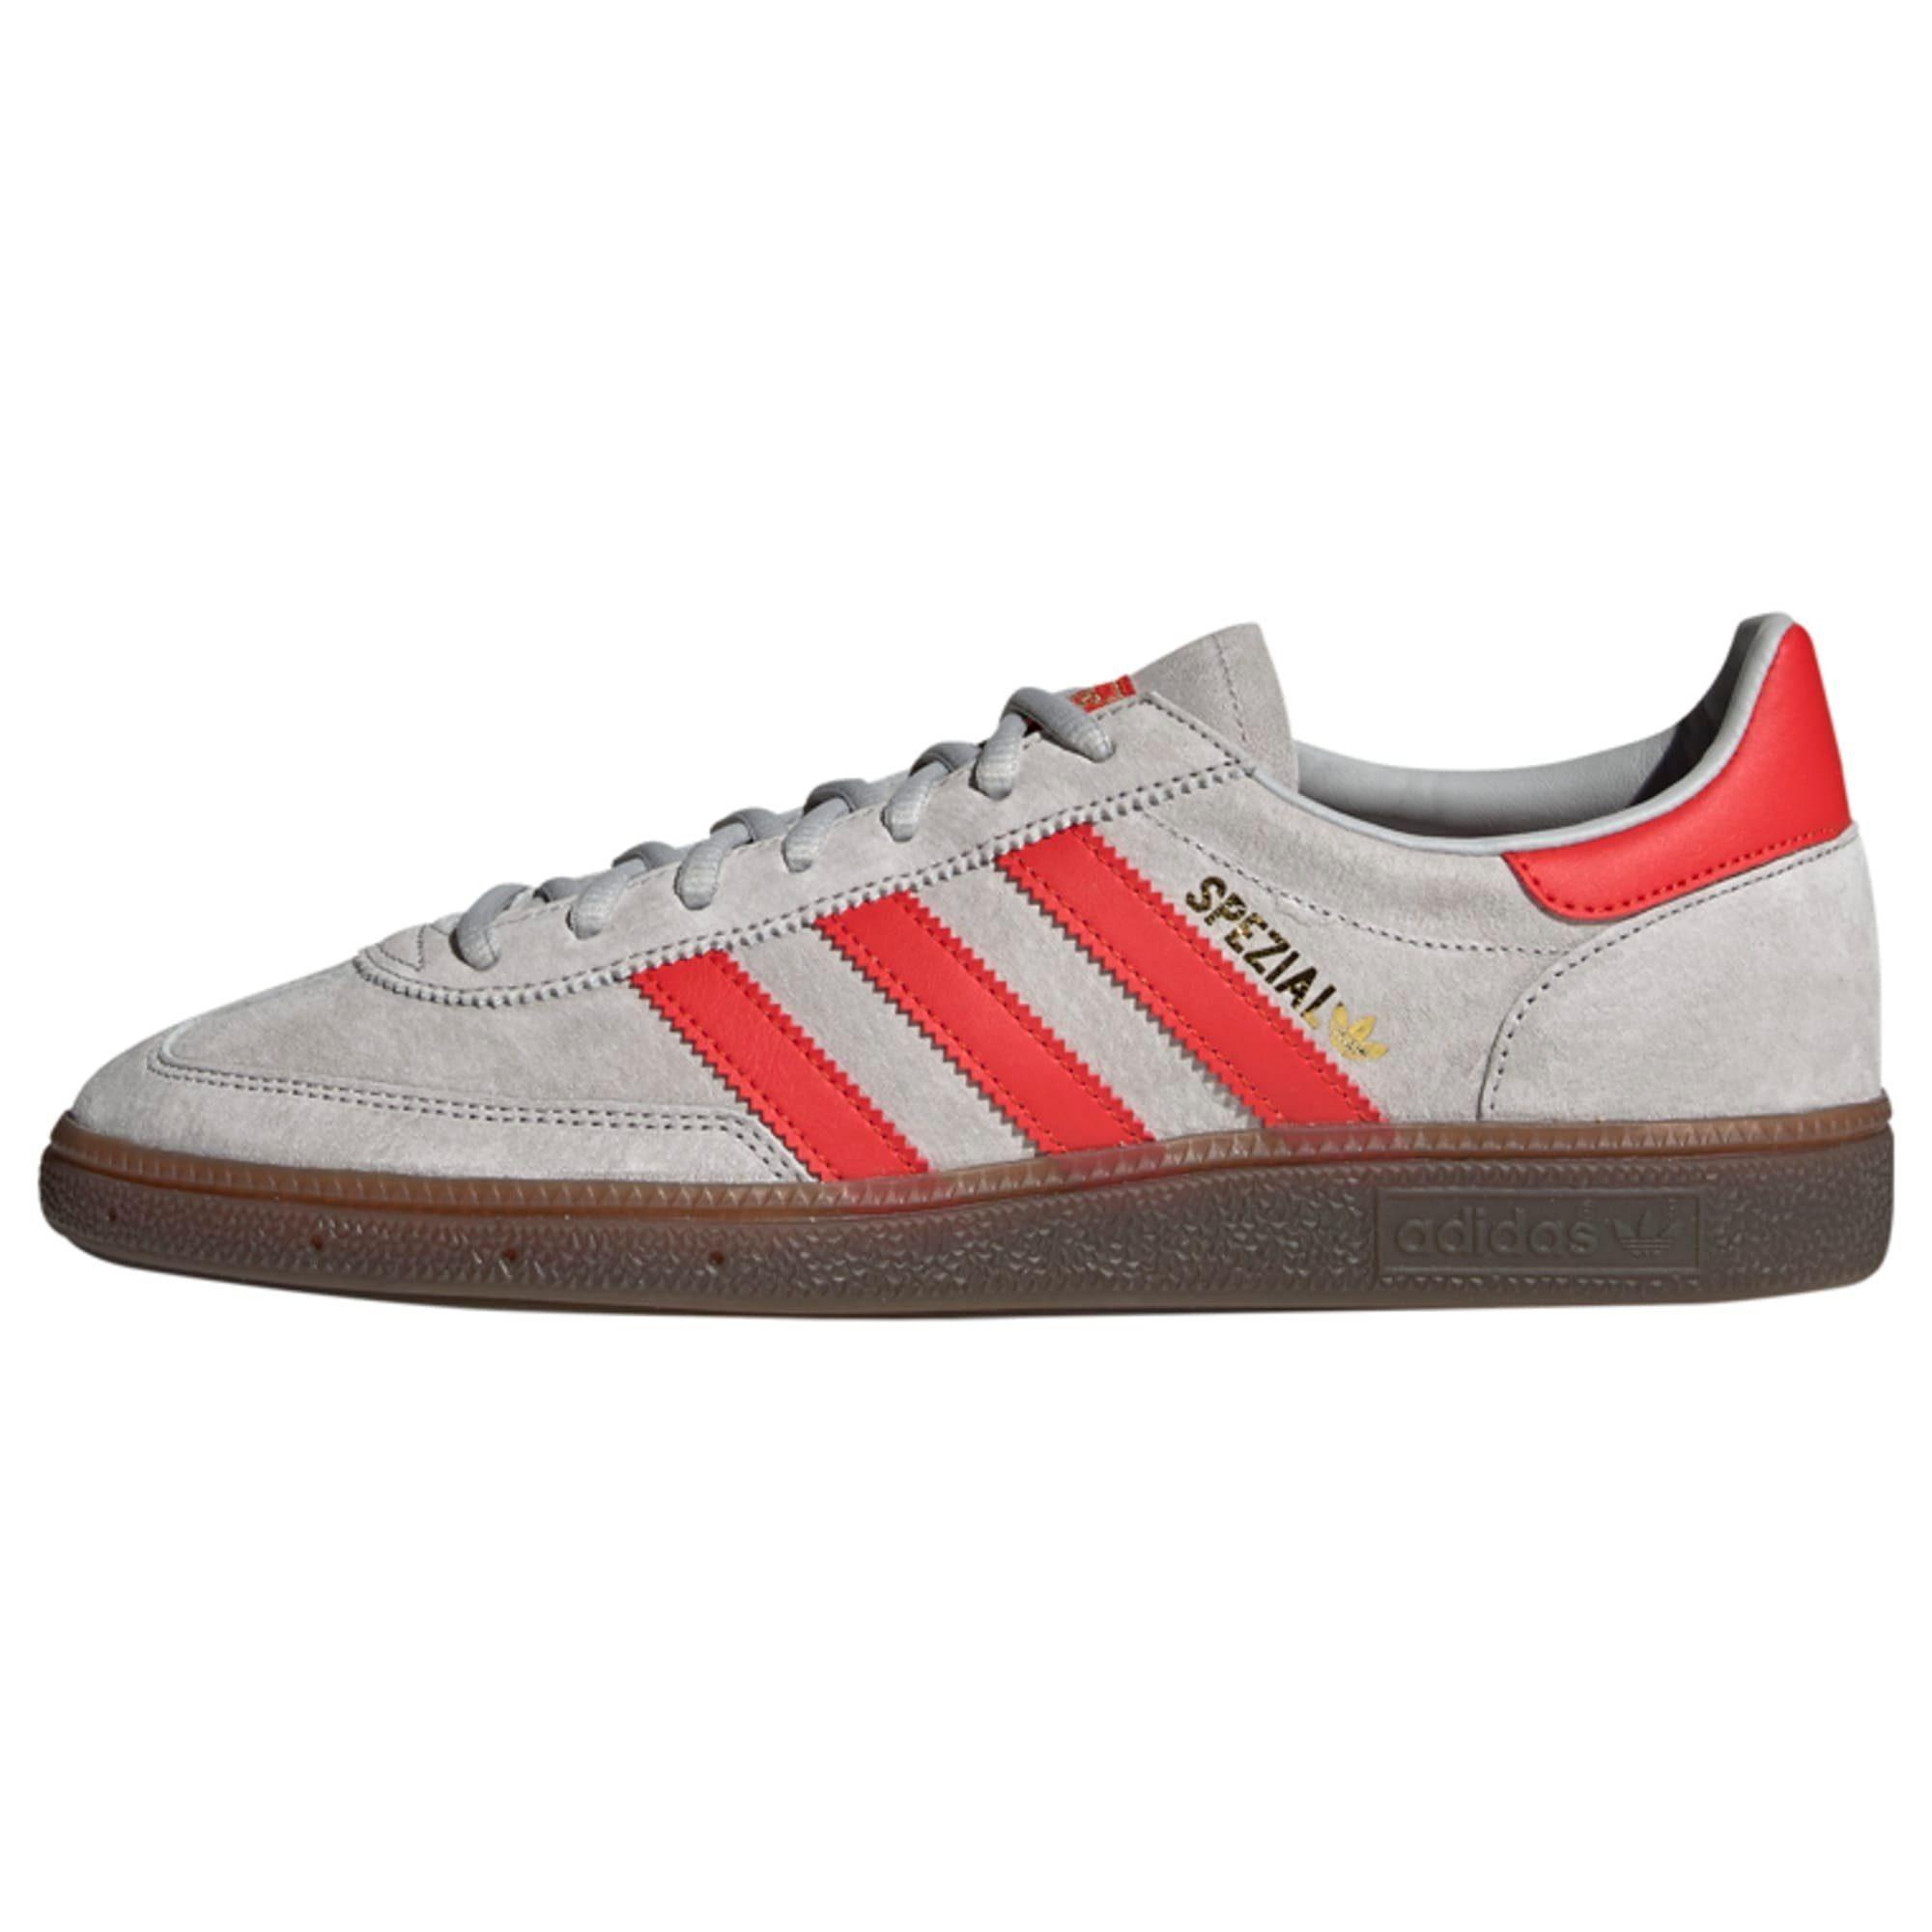 adidas Originals »Handball Spezial Schuh« Trainingsschuh Spezial;TERRACE online kaufen | OTTO